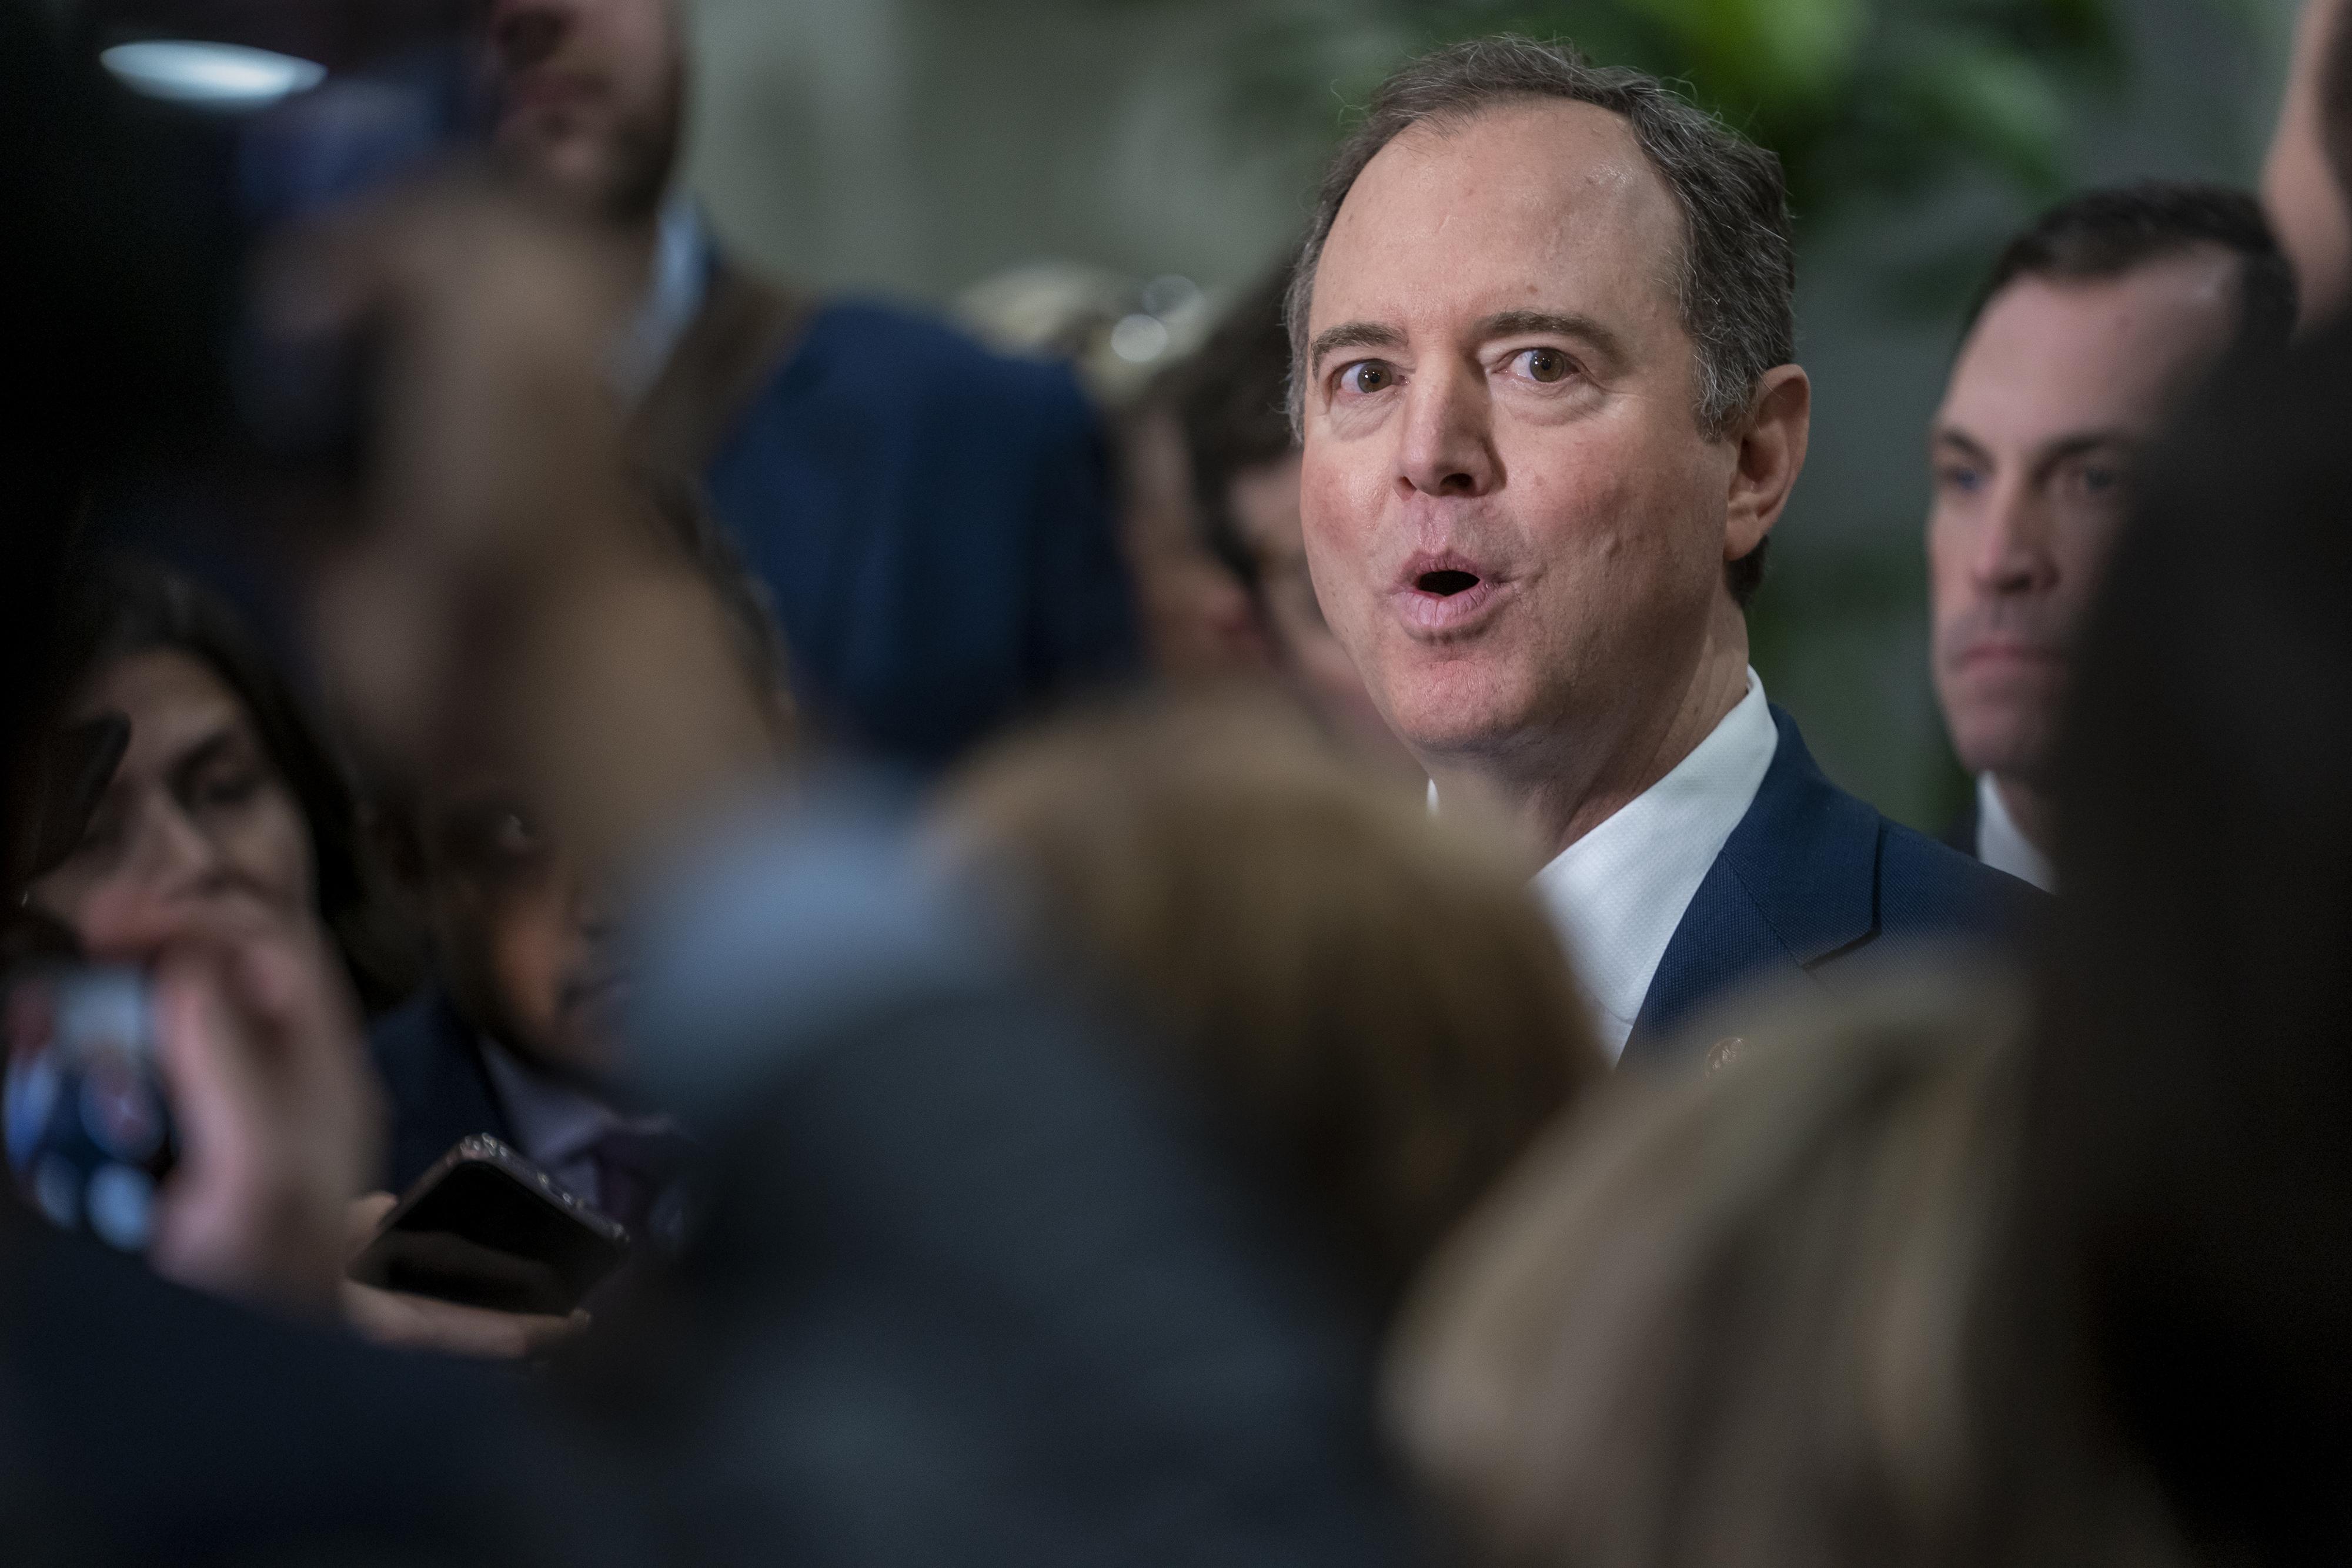 The eight ways Adam Schiff fudged the facts in prosecuting Trump's impeachment